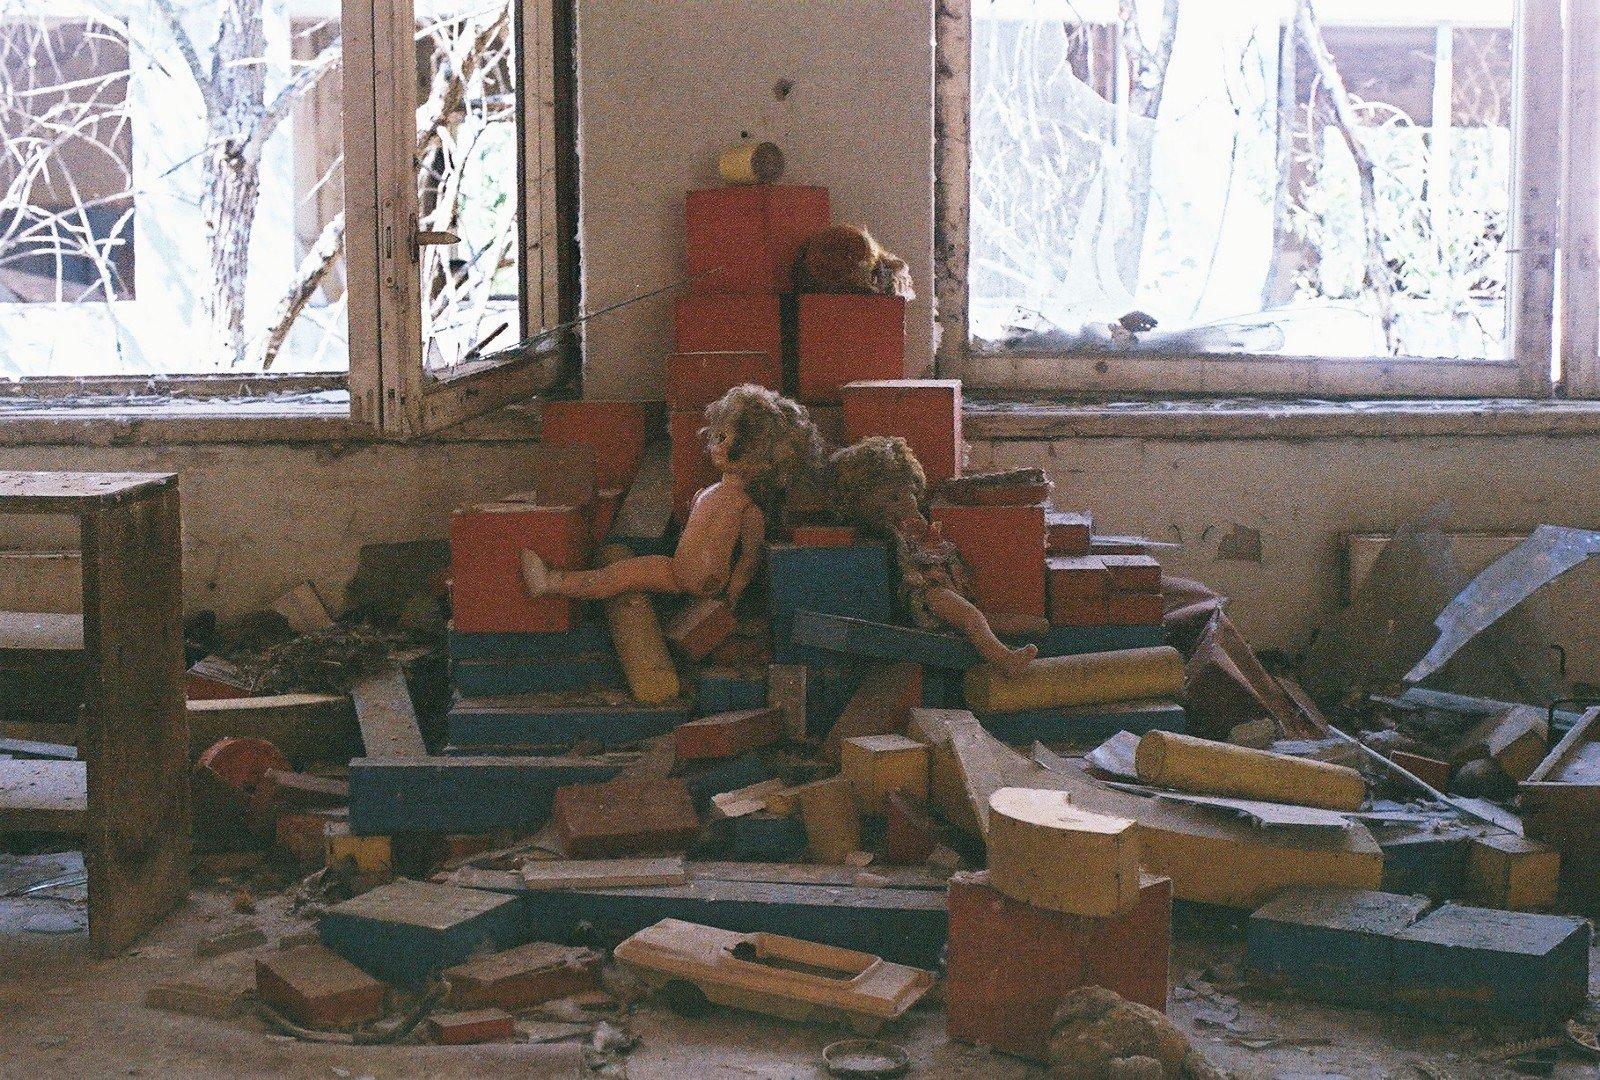 snaeking-into-chernobyl11 SNEAKING INTO CHERNOBYL